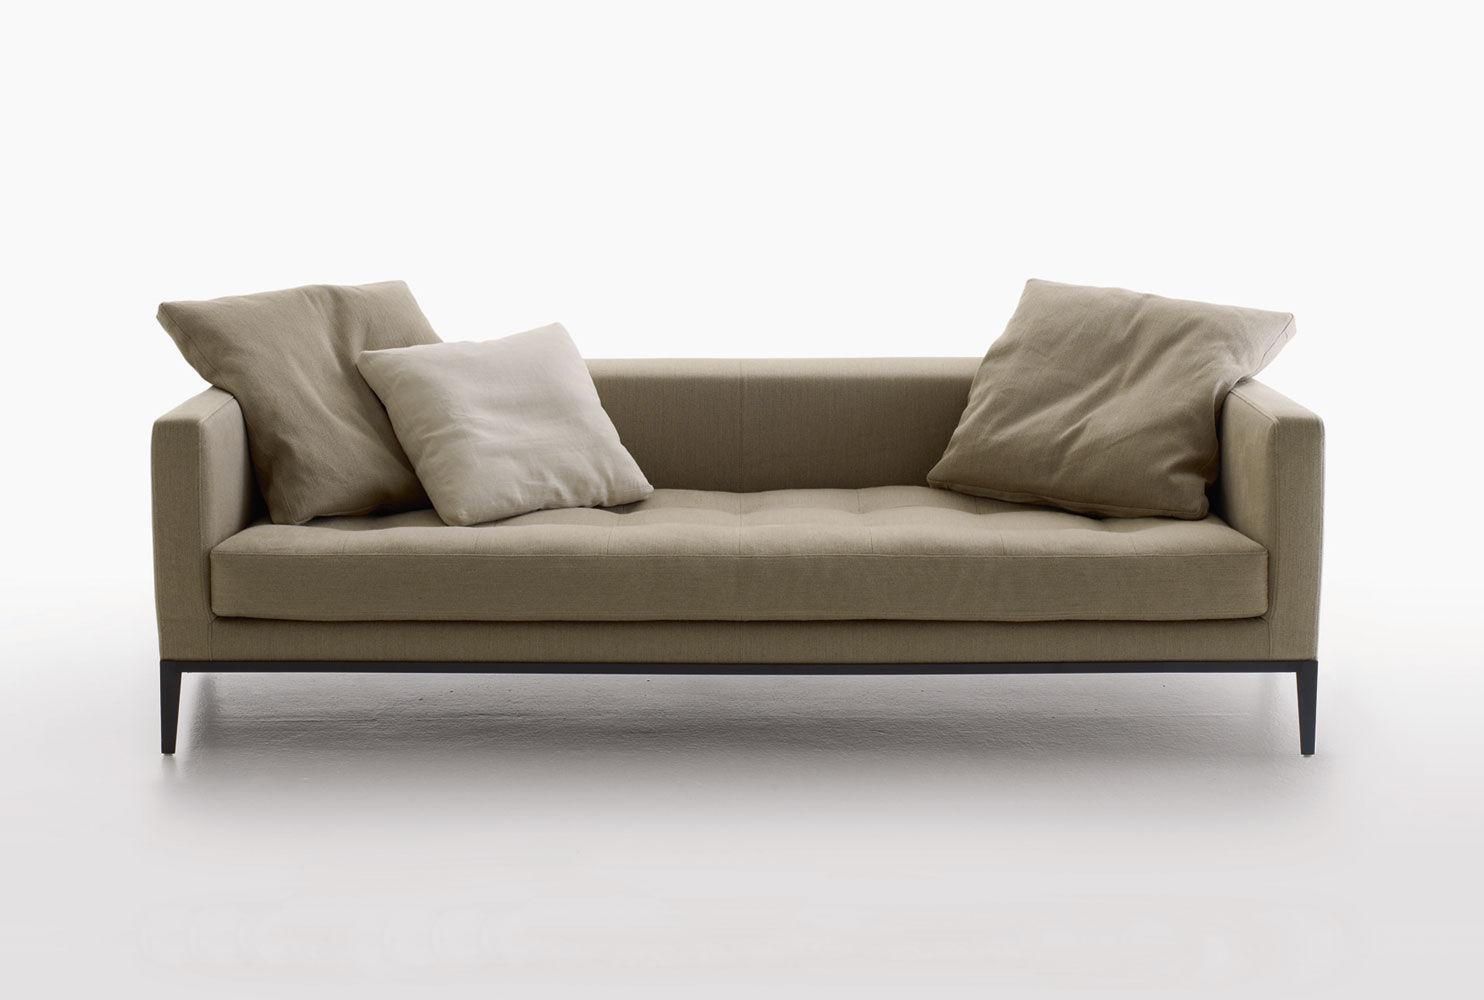 Charming Contemporary Sofa / Fabric / By Antonio Citterio / 3 Seater SIMPLICITER  MAXALTO ...